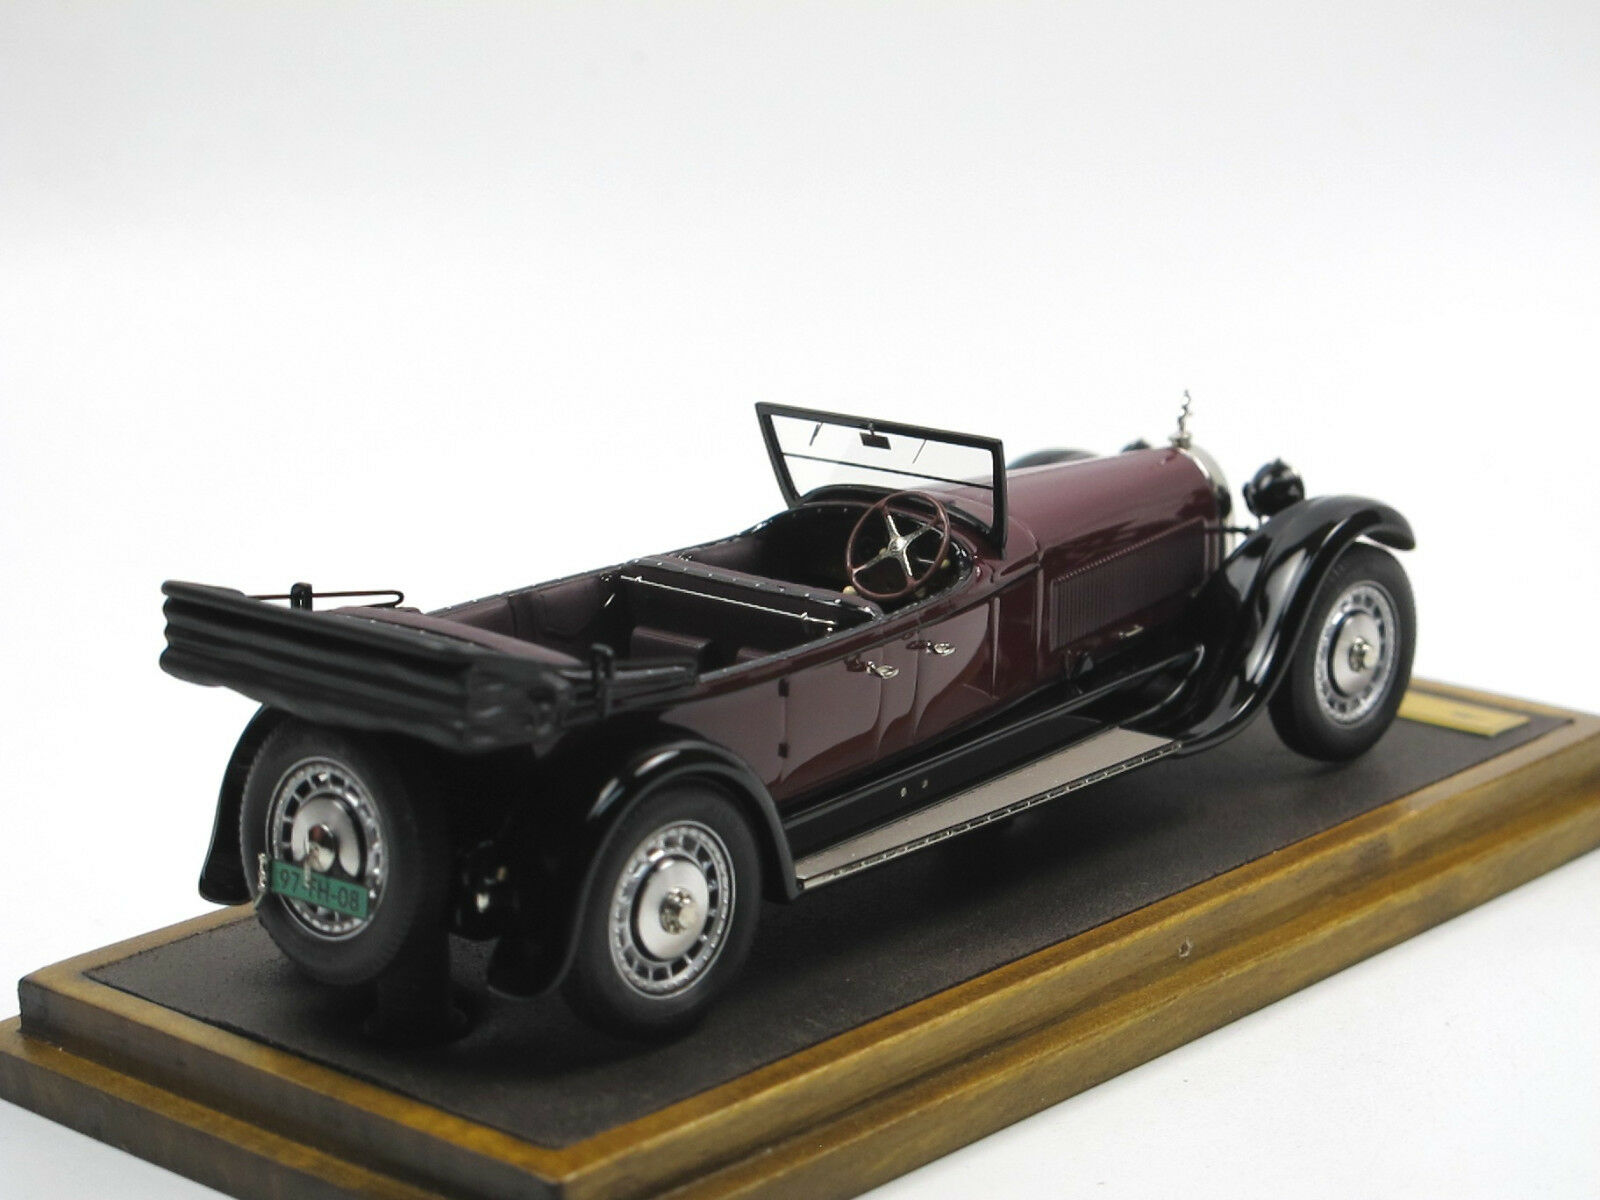 EMC EMC EMC 1927 Bugatti 41-100 Royale Phaeton Packard body version restaurée 2011 1 43 df47e1